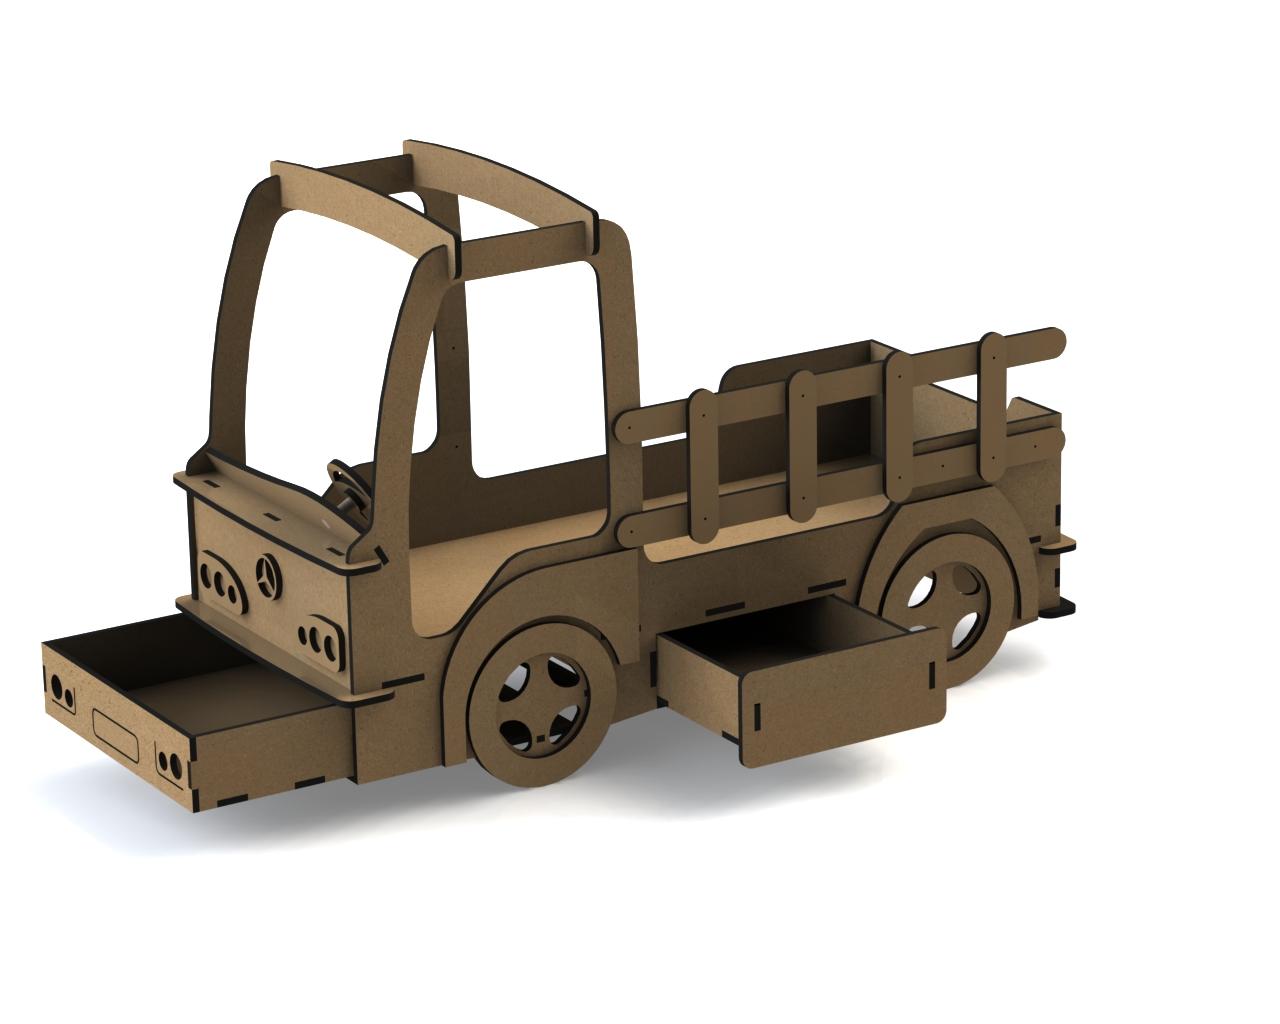 Car Beds For Kids Laser Cut 3d Puzzle Free CDR Vectors Art